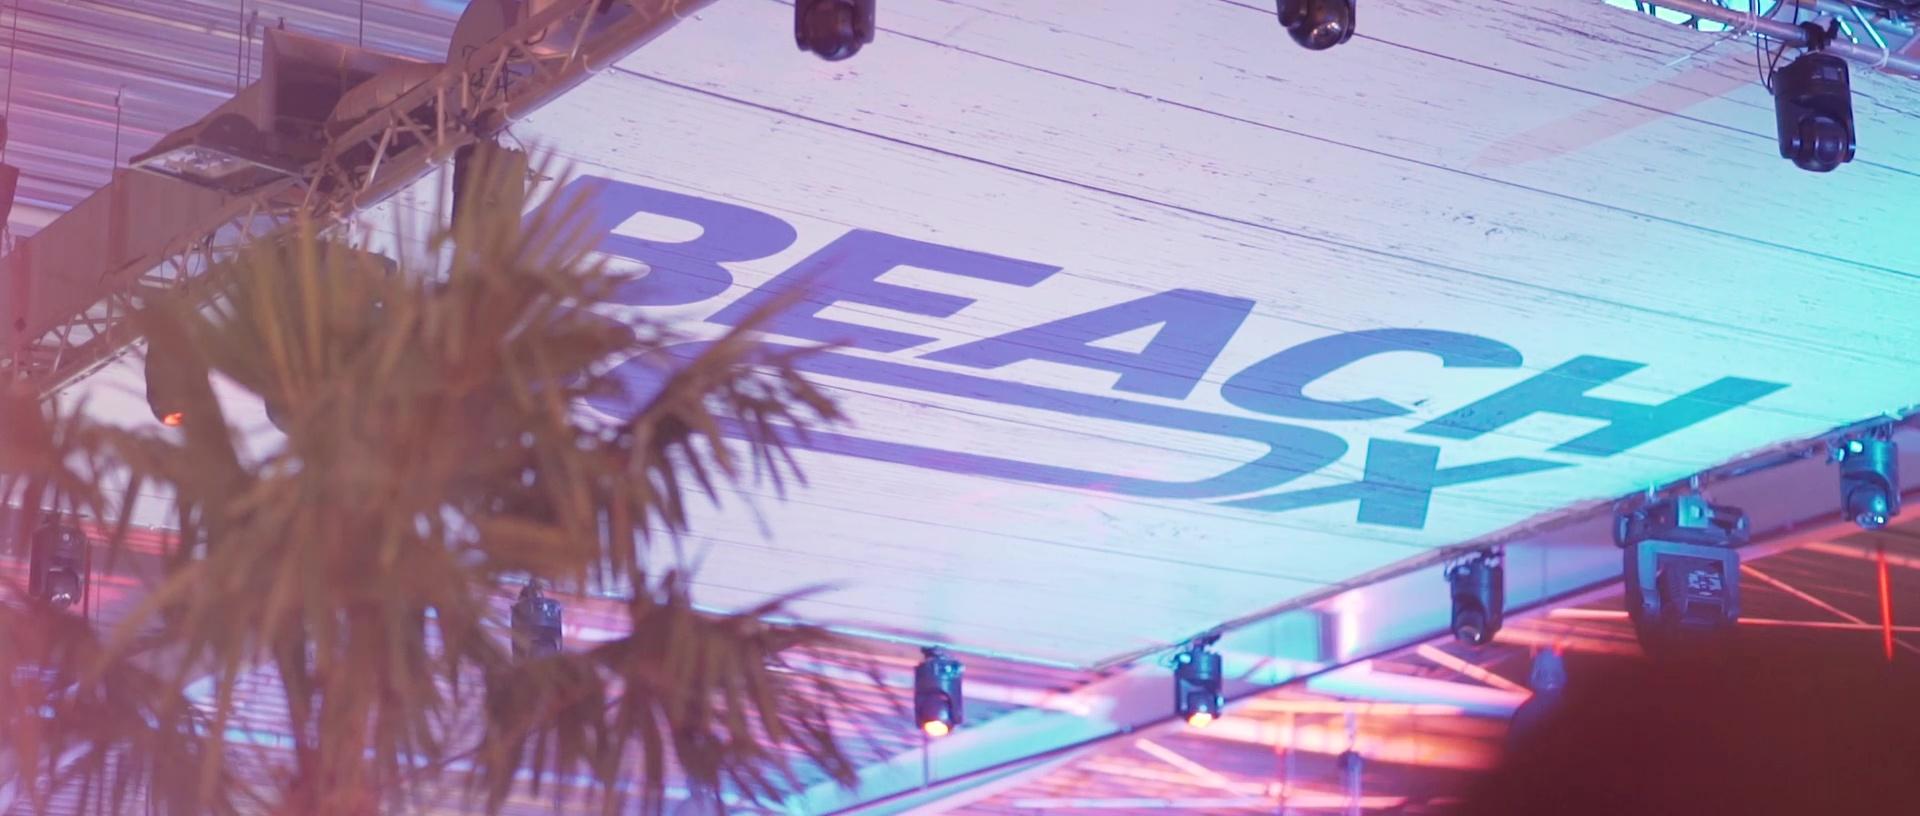 BeachBox18_SylvainArmand_00006